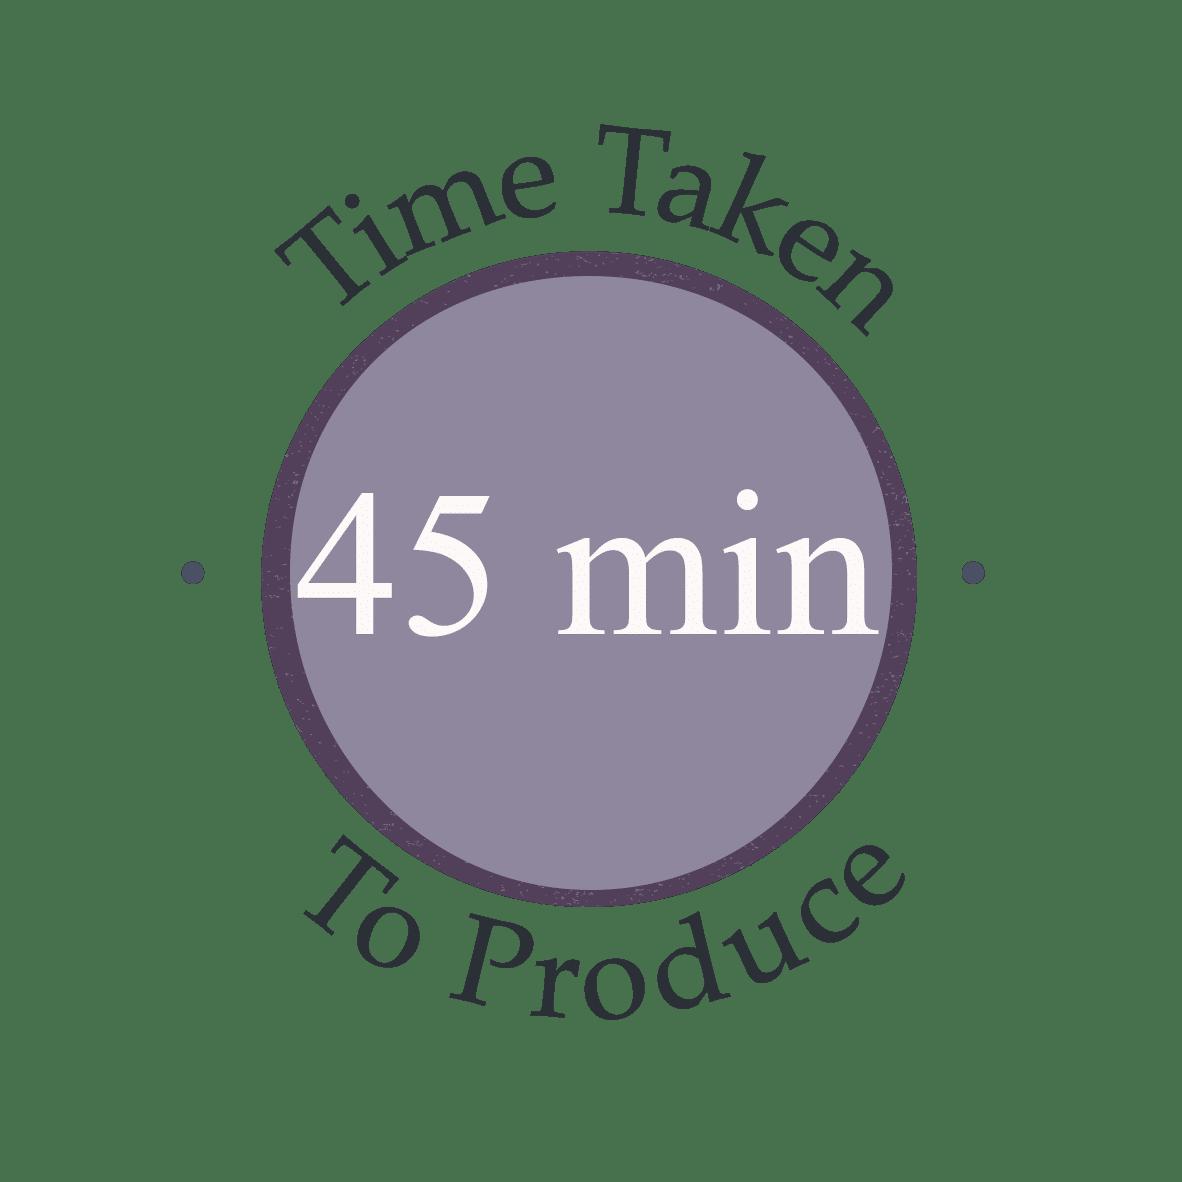 45 minutes to make recipe